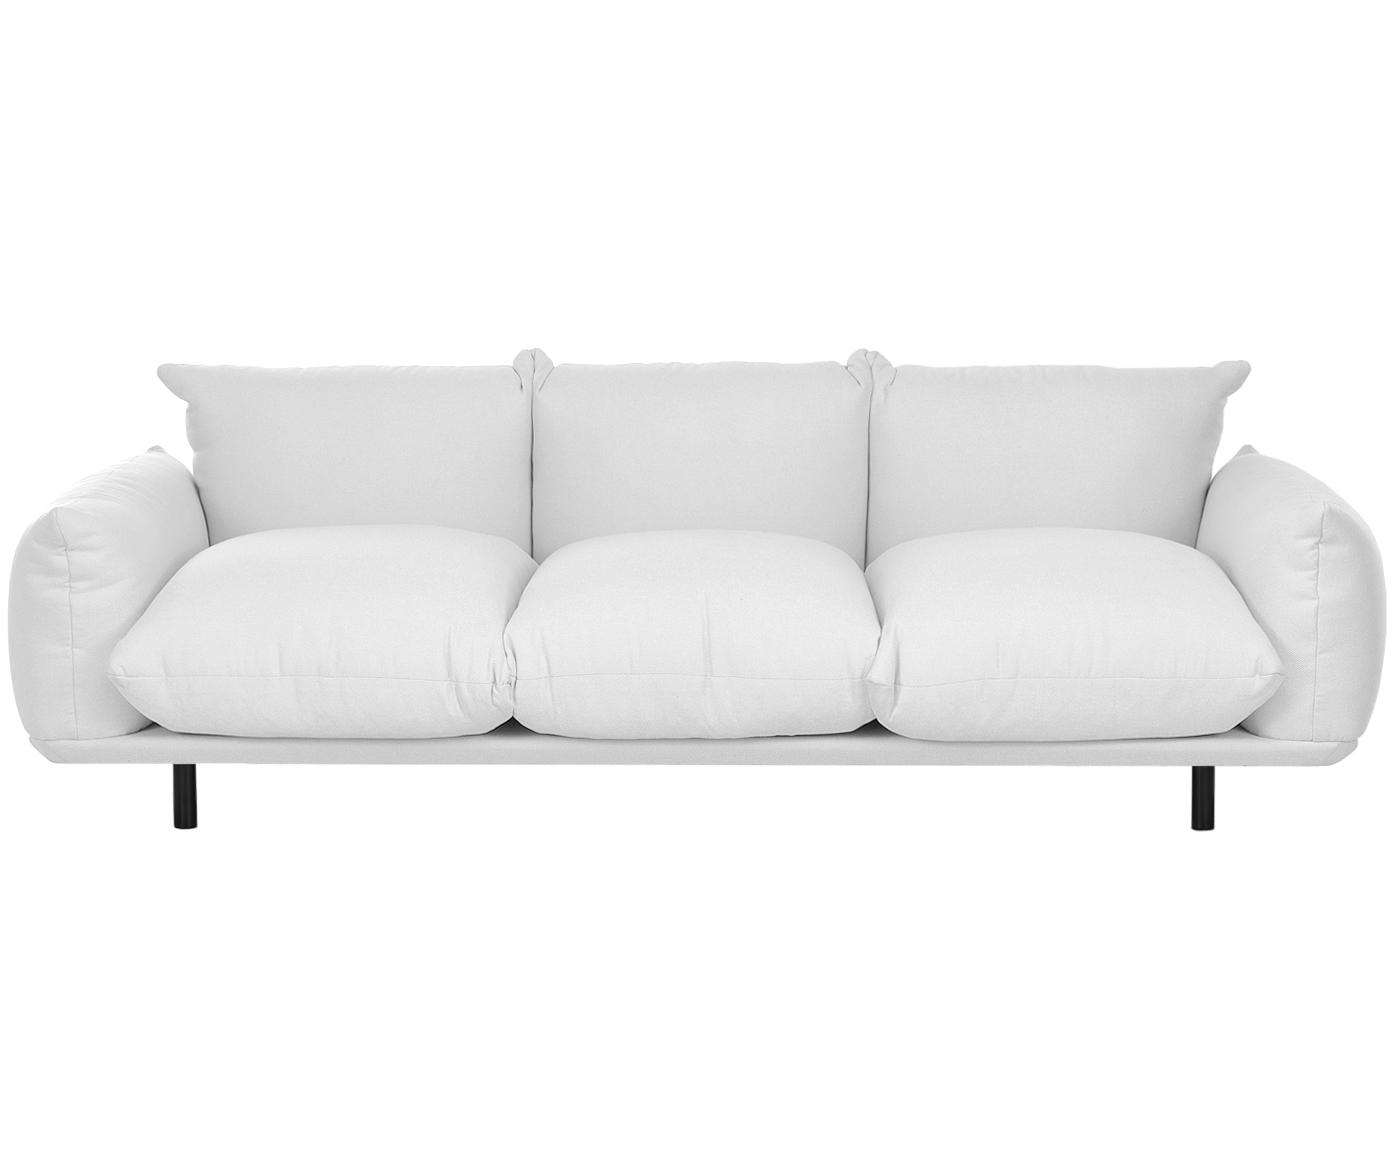 Sofa Saga (3-Sitzer), Bezug: 100% Polyester 35.000 Sch, Gestell: Massives Birkenholz, Füße: Metall, pulverbeschichtet, Webstoff Hellgrau, B 232 x T 103 cm